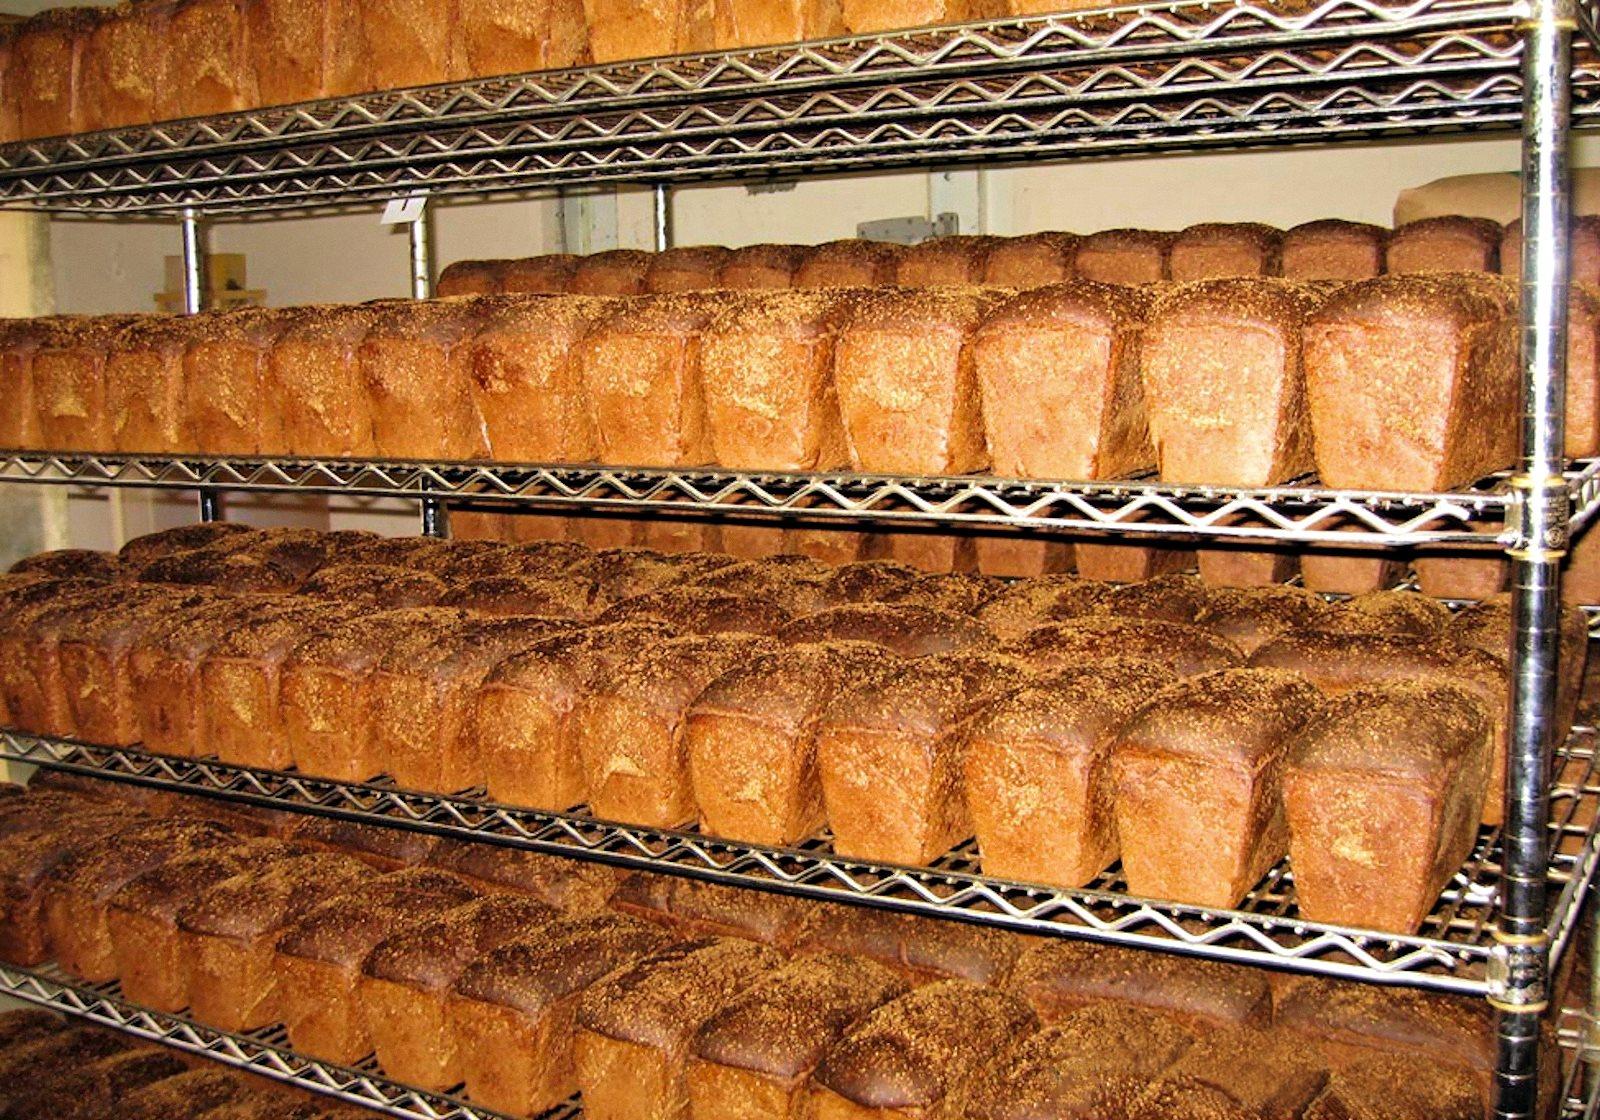 00 russian bread. 24.04.15